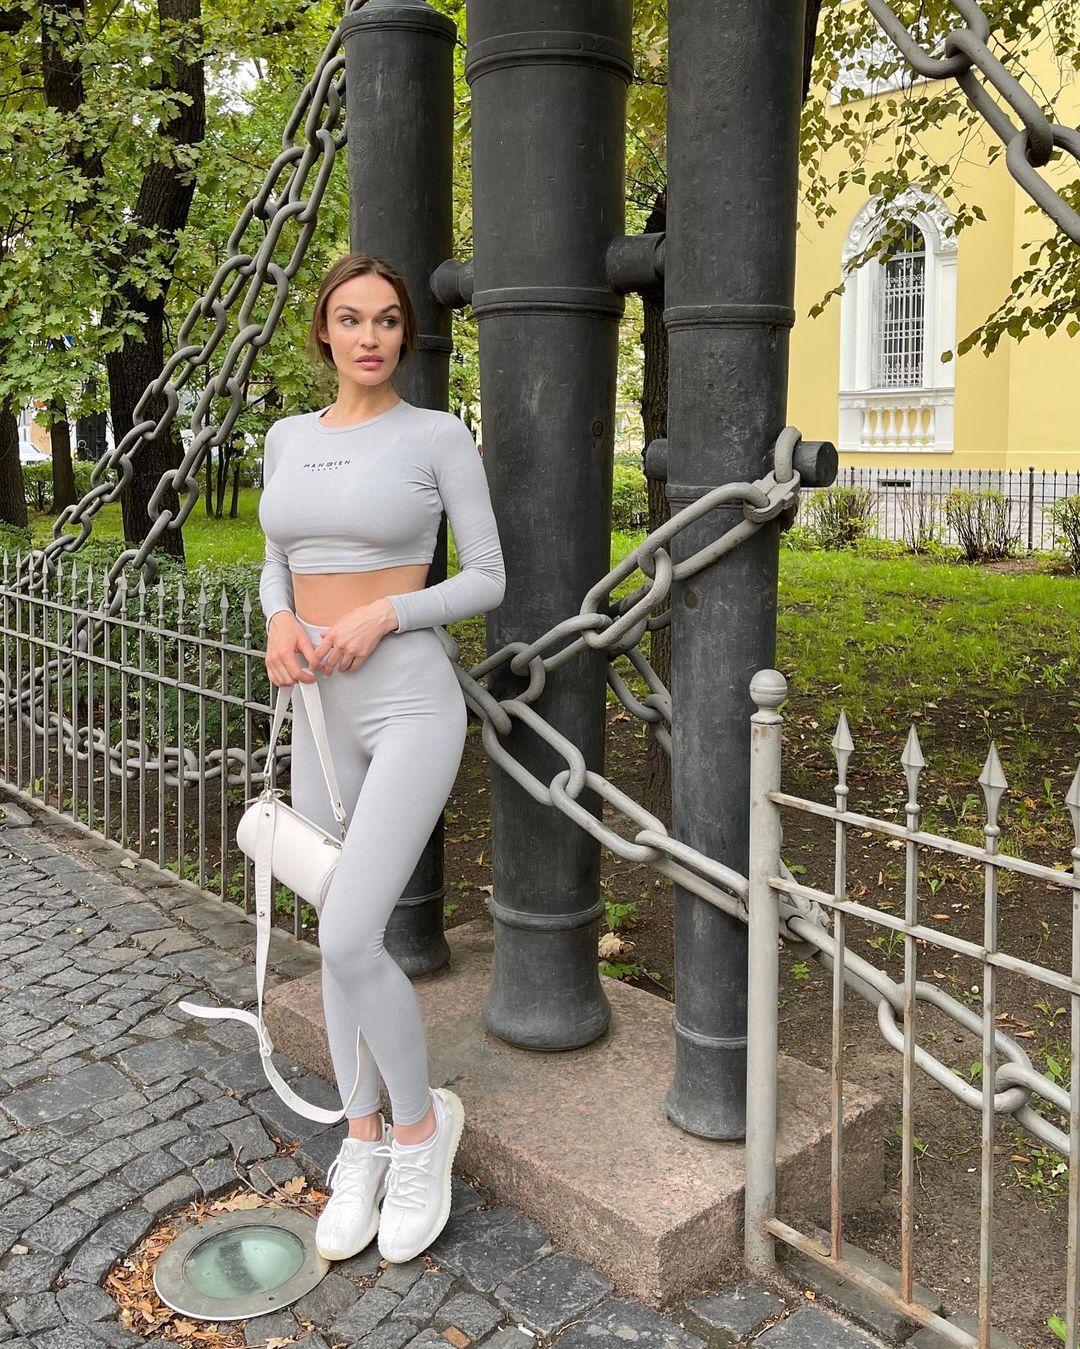 Внешний вид: Алёна Водонаева отправилась на прогулку по Санкт-Петербургу, надев облегающий костюм